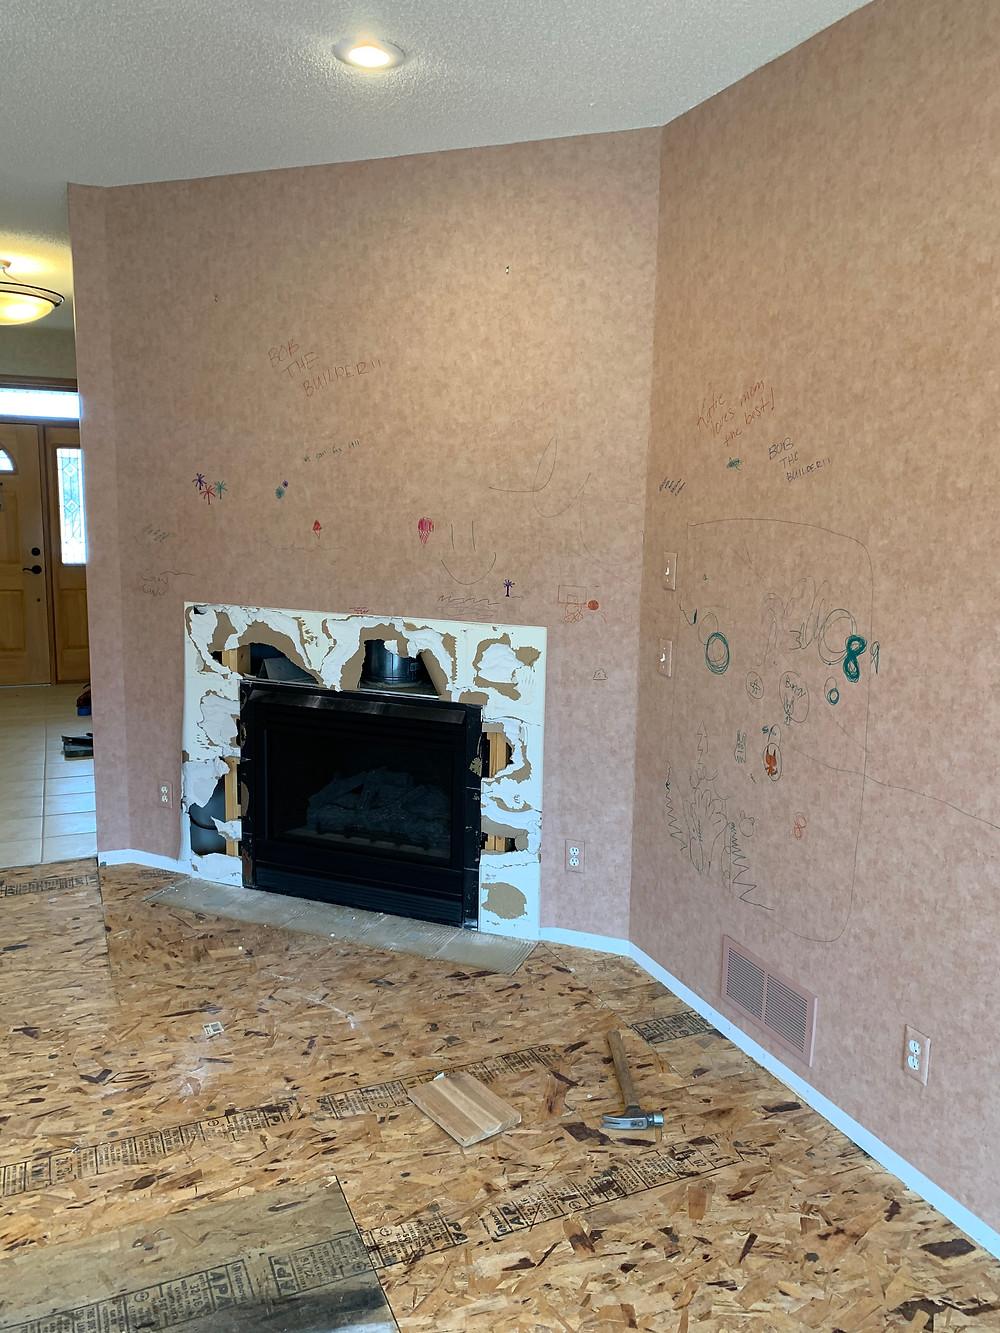 Demo day | Pinnacle Interior Designs